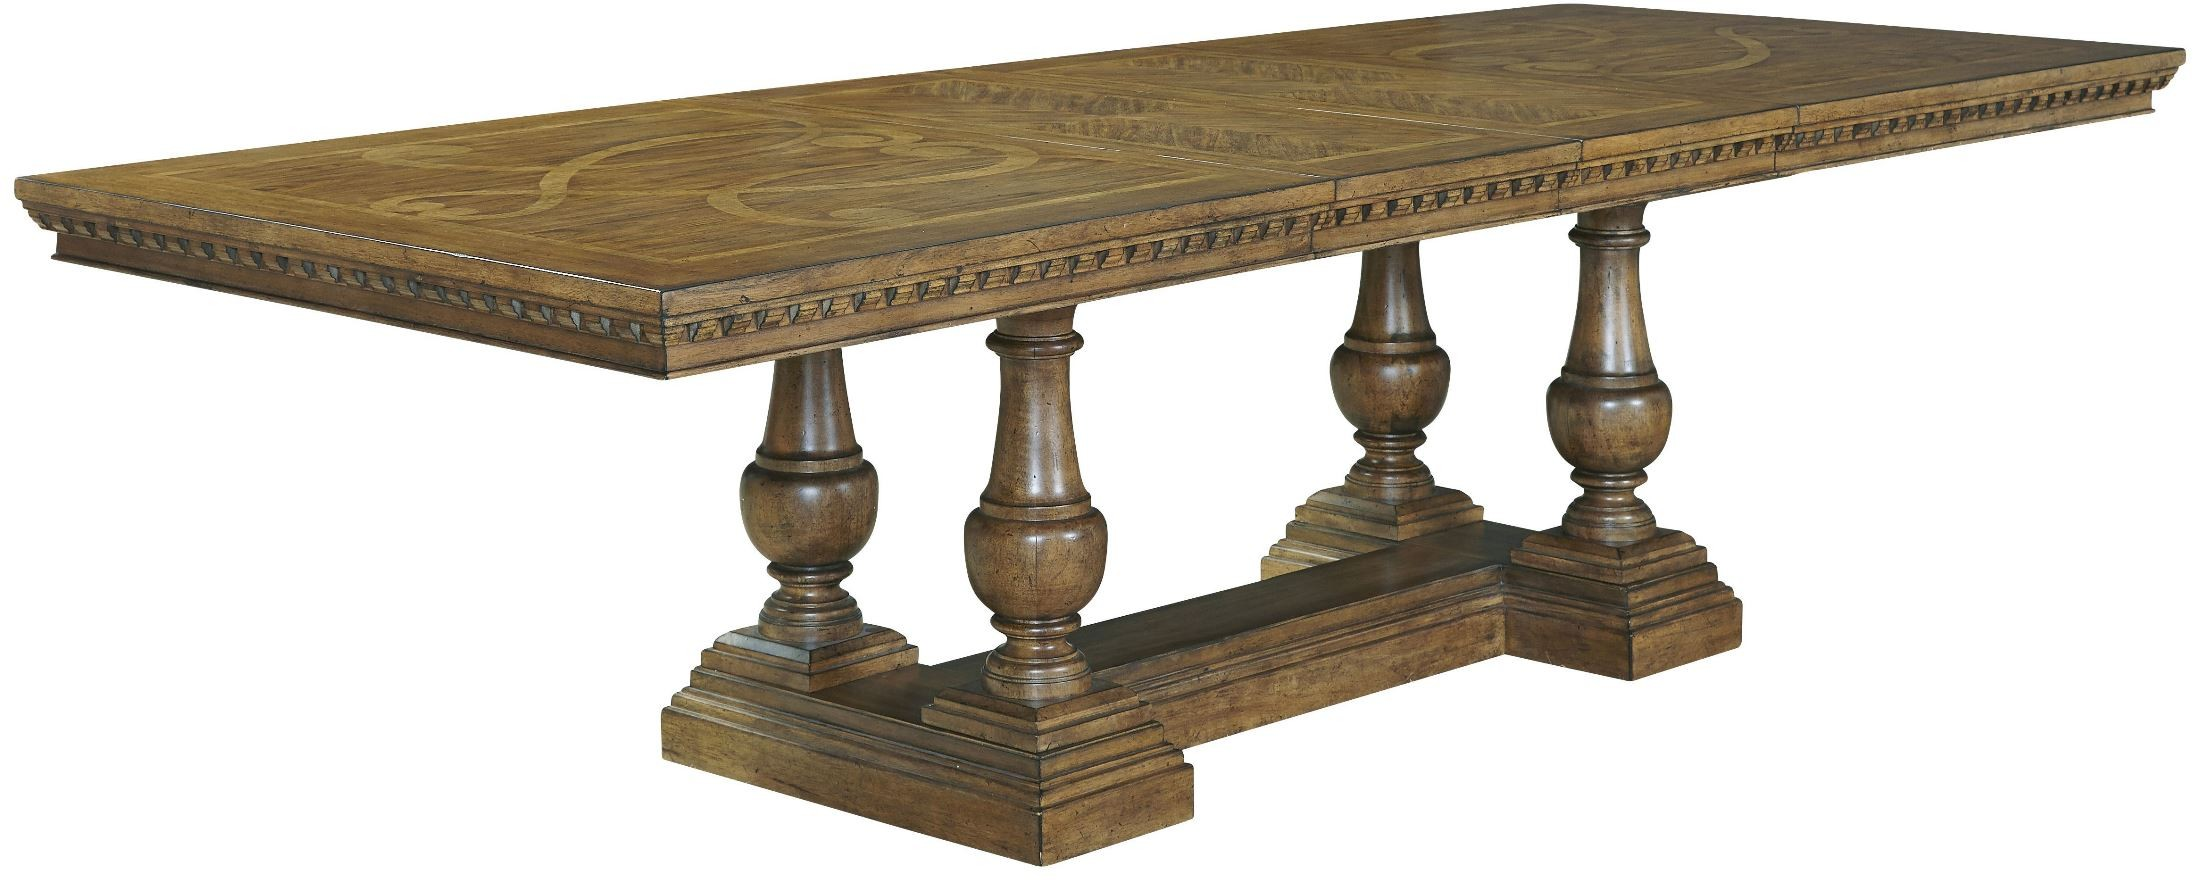 stratton medium wood extendable trestle dining table from pulaski 737240 41 coleman furniture. Black Bedroom Furniture Sets. Home Design Ideas